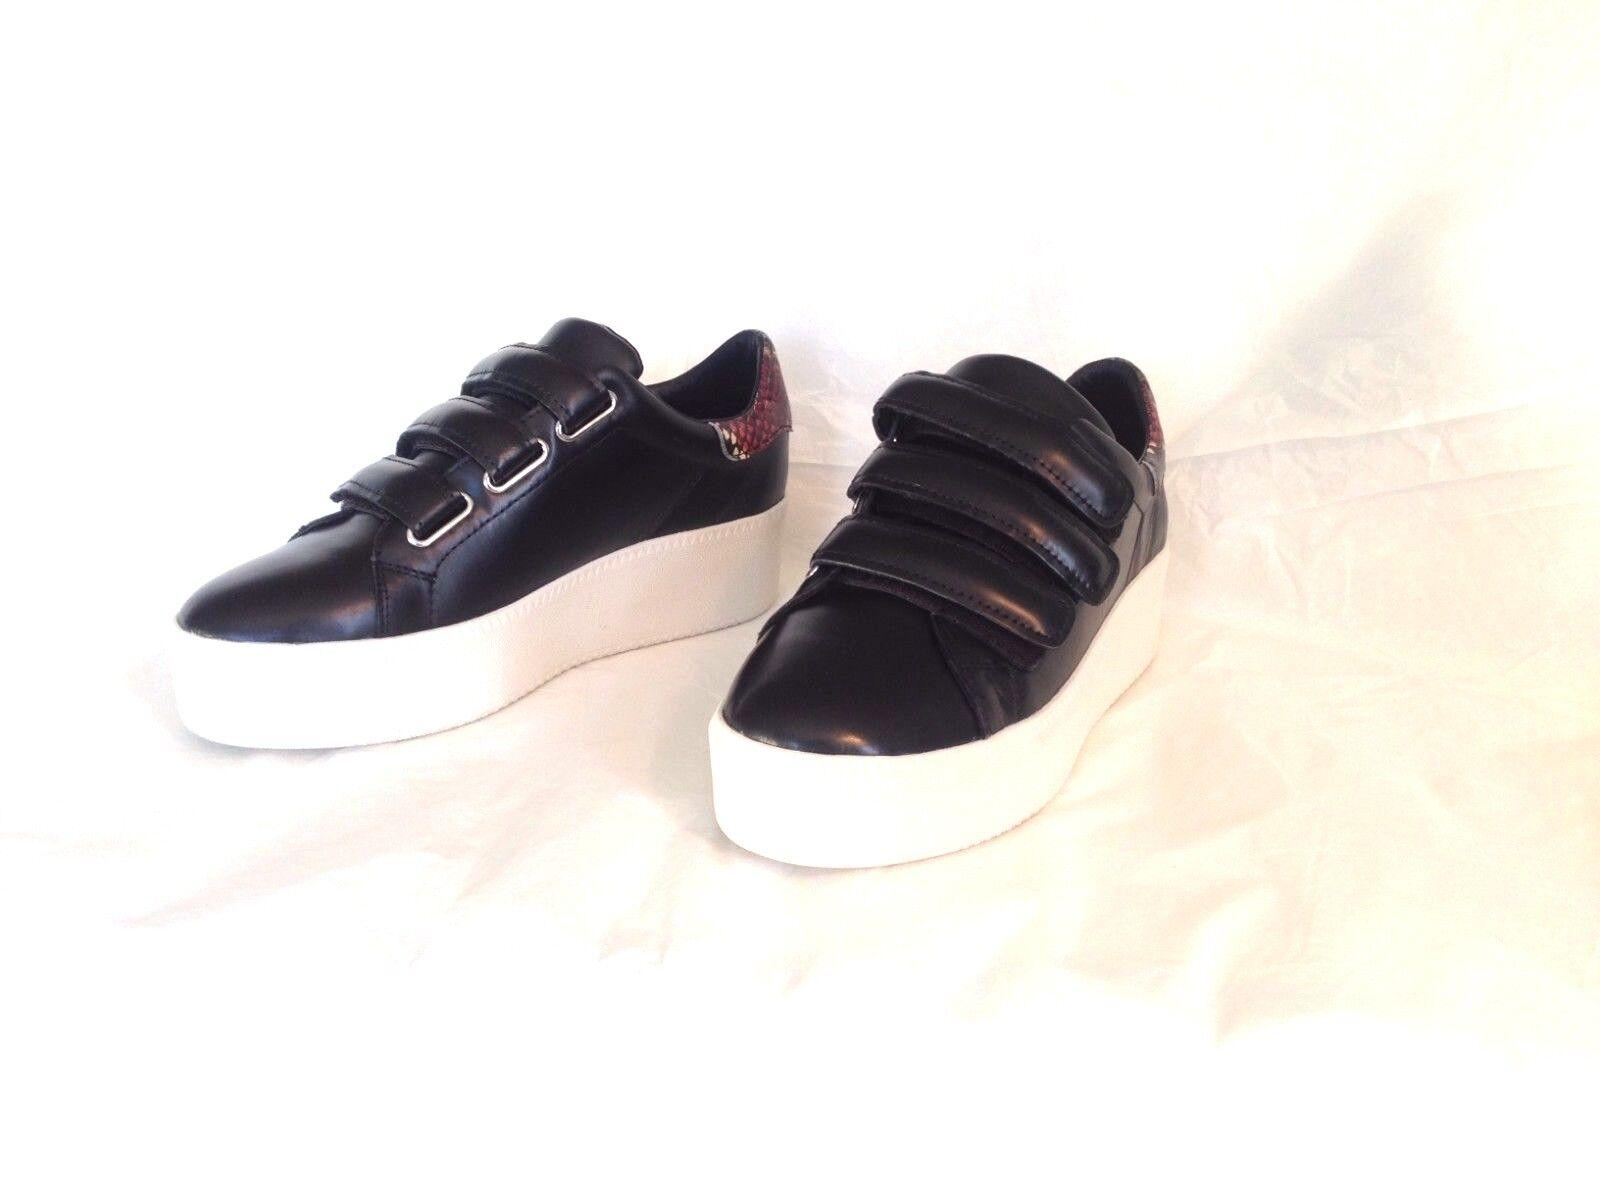 Brand-New with Box  Black Platform Platform Platform Sneakers by ASH, Size 10 (41) bc3f52